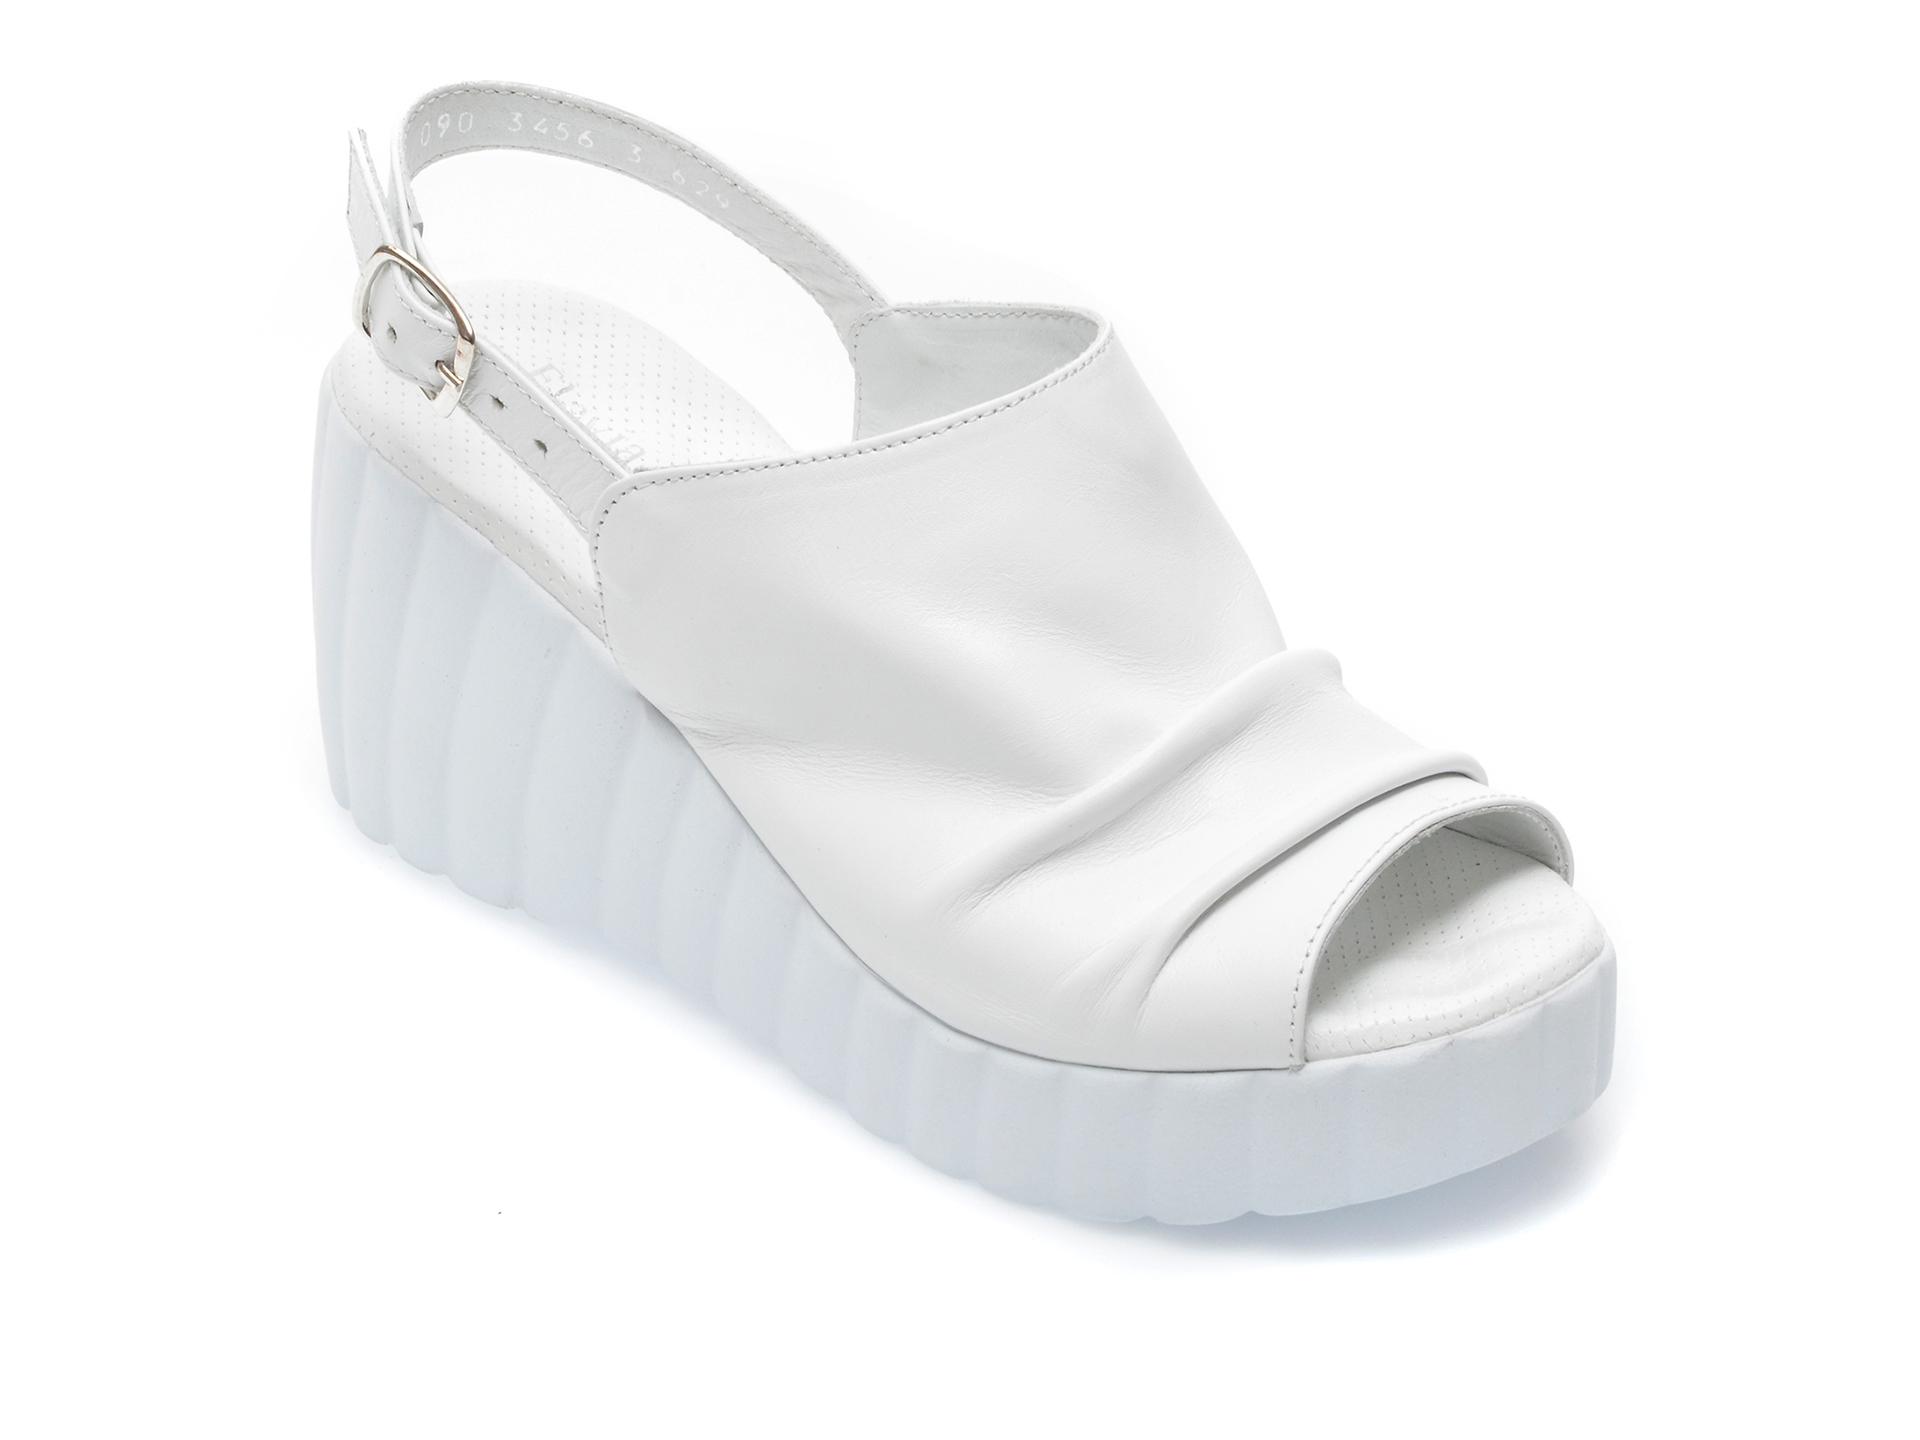 Sandale FLAVIA PASSINI albe, 903463, din piele naturala imagine otter.ro 2021